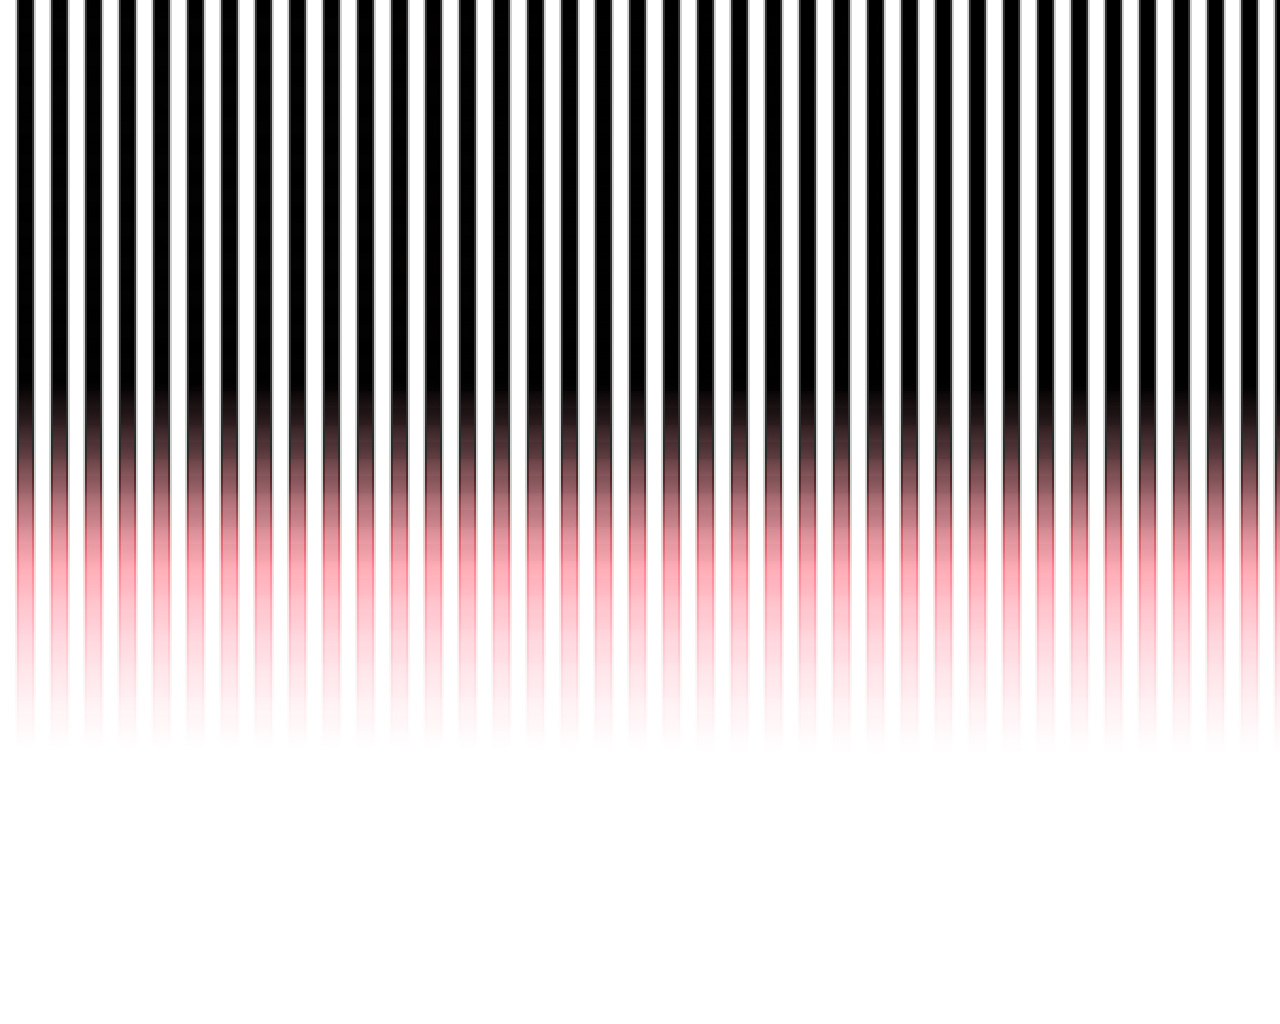 Wallpaper Stripes Design : Sh yn design stripe wallpaper black pink